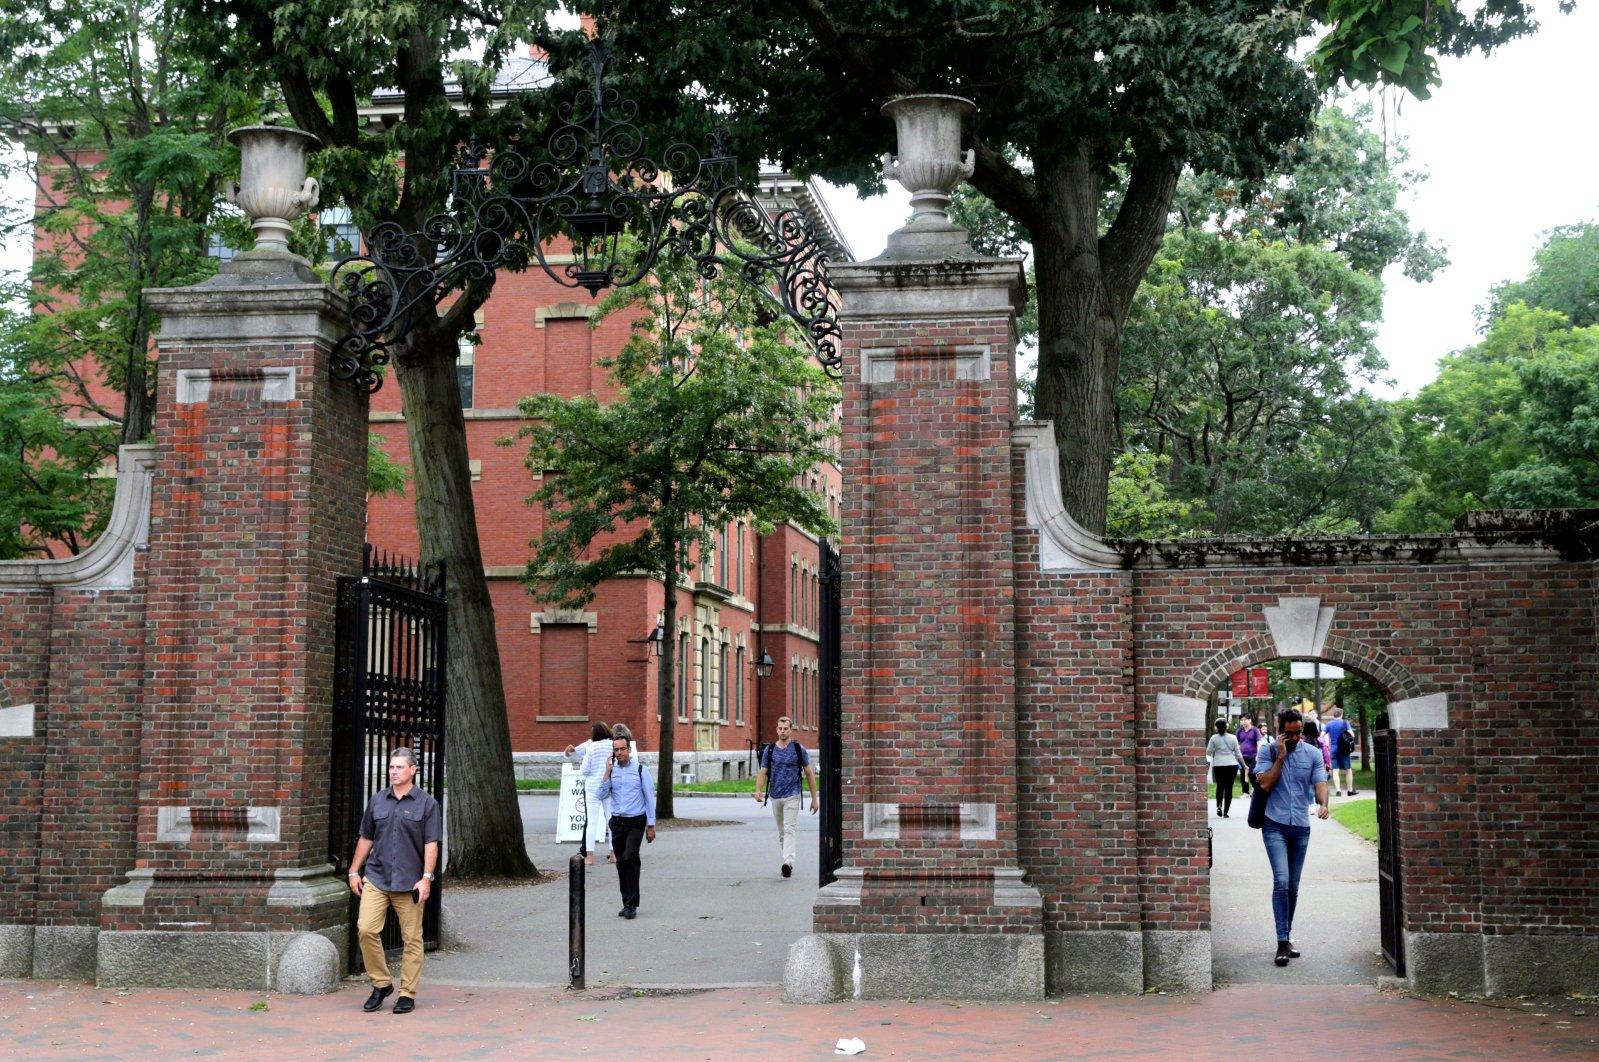 Pedestrians walk through the gates of Harvard Yard at Harvard University in Cambridge, Massachusetts, U.S., Aug. 13, 2019. (AP Photo)